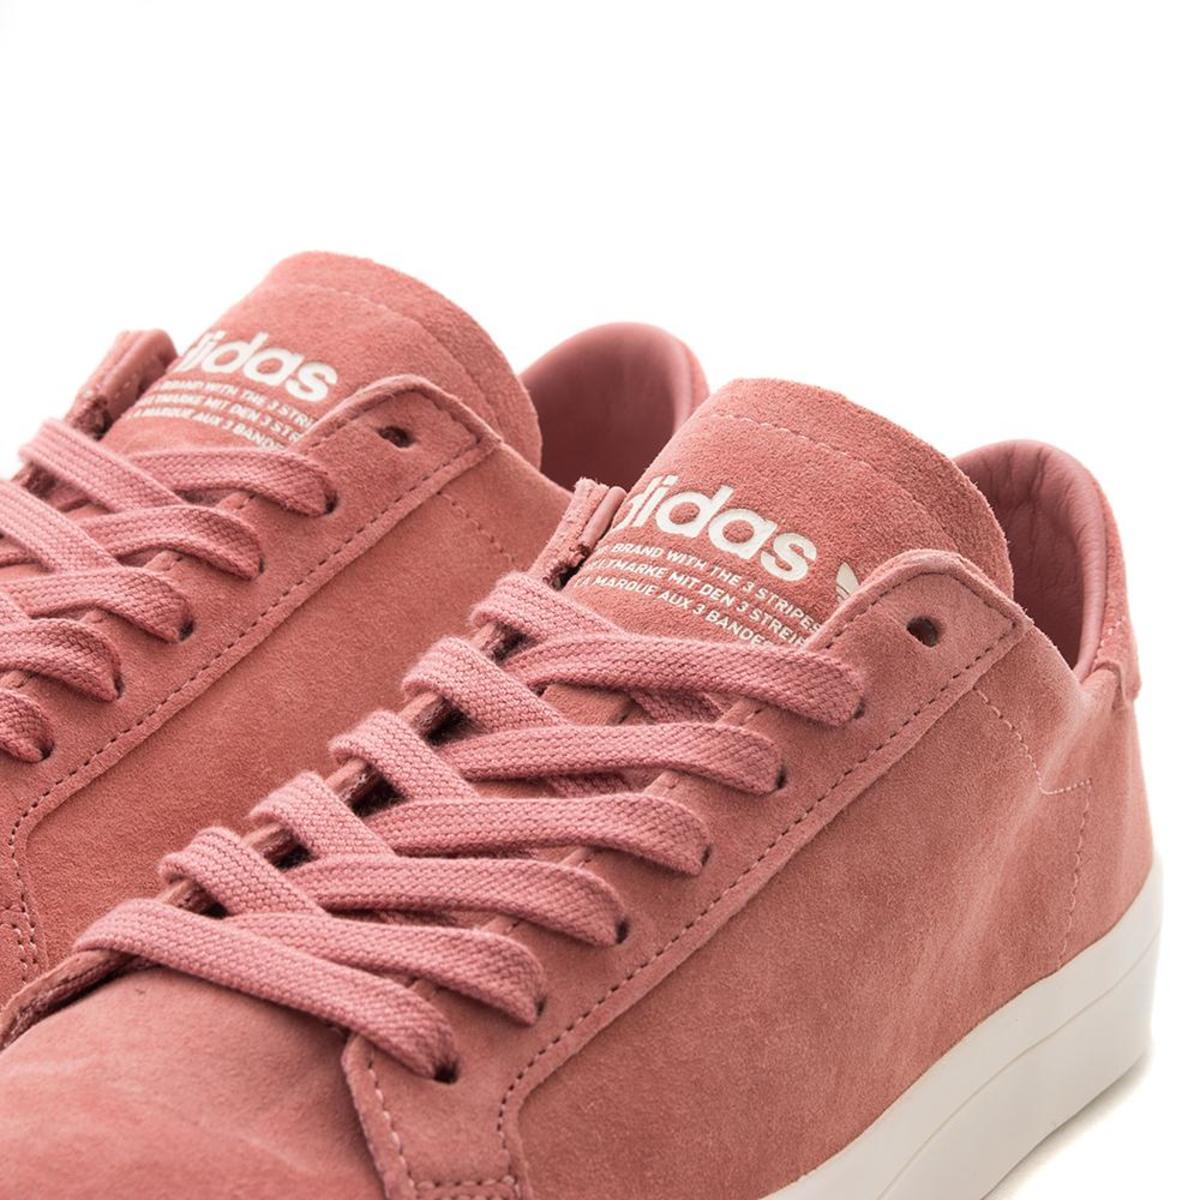 best sneakers cc189 25e69 8, 8.5, 9, 9.5, 10, 10.5, 11, 12